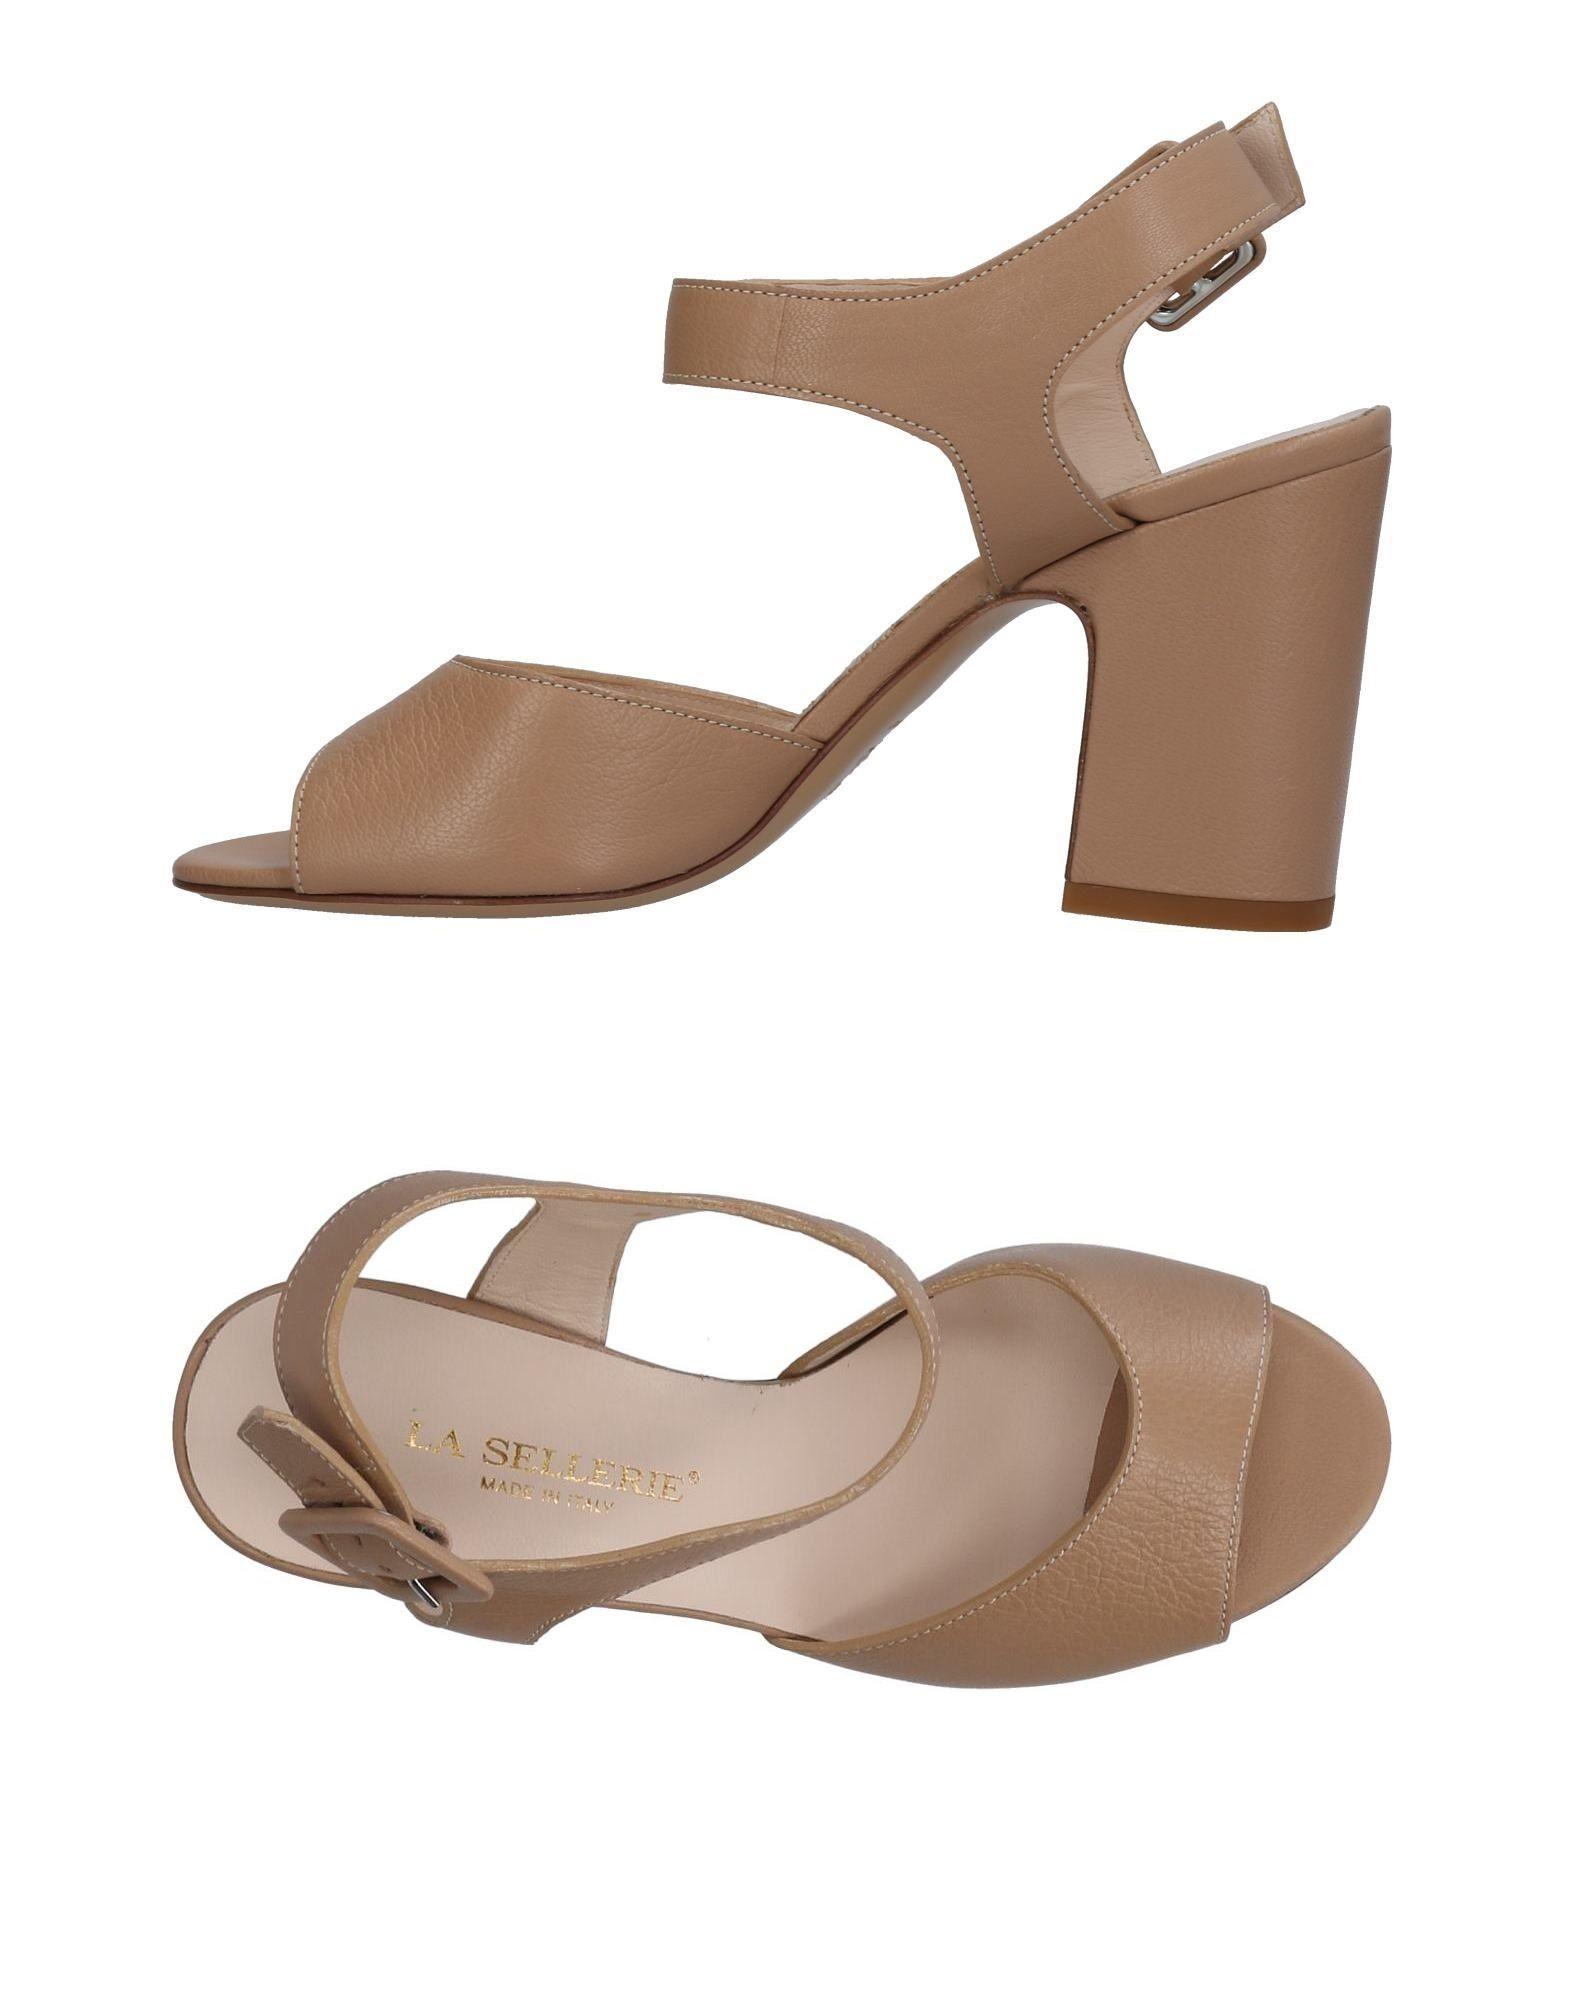 La Sellerie Sandalen Damen  11456289NC Gute Qualität beliebte Schuhe